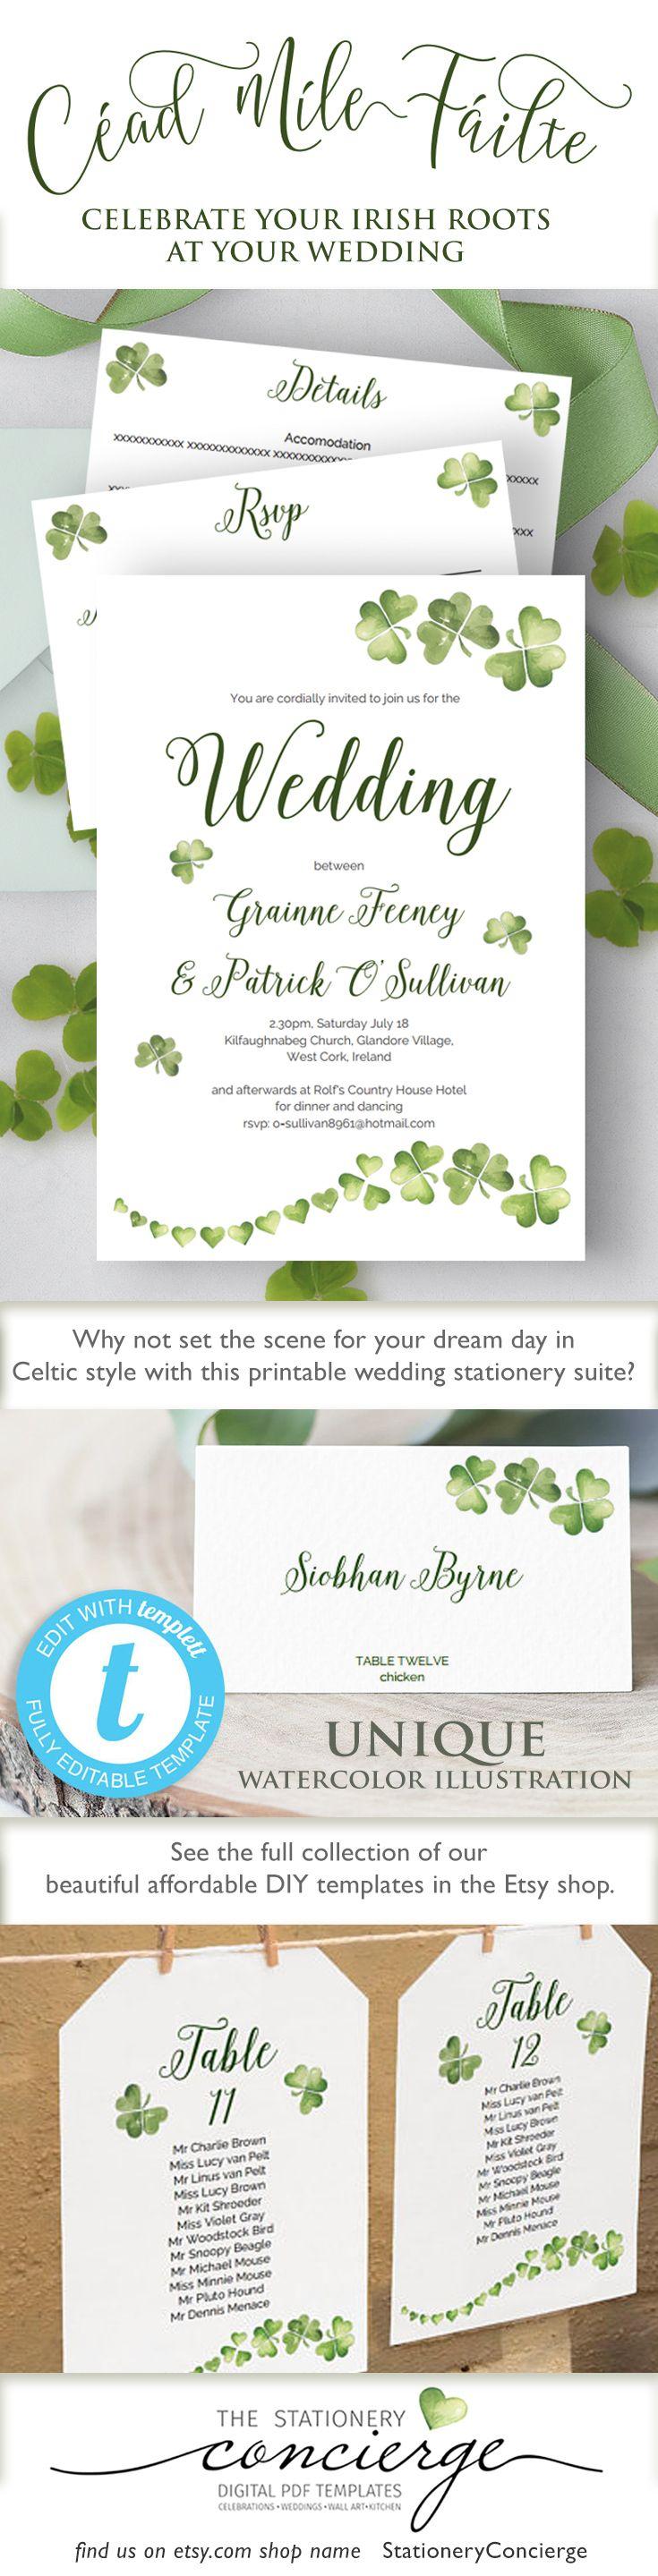 7 Best Wedding Invites Images On Pinterest Celtic Wedding